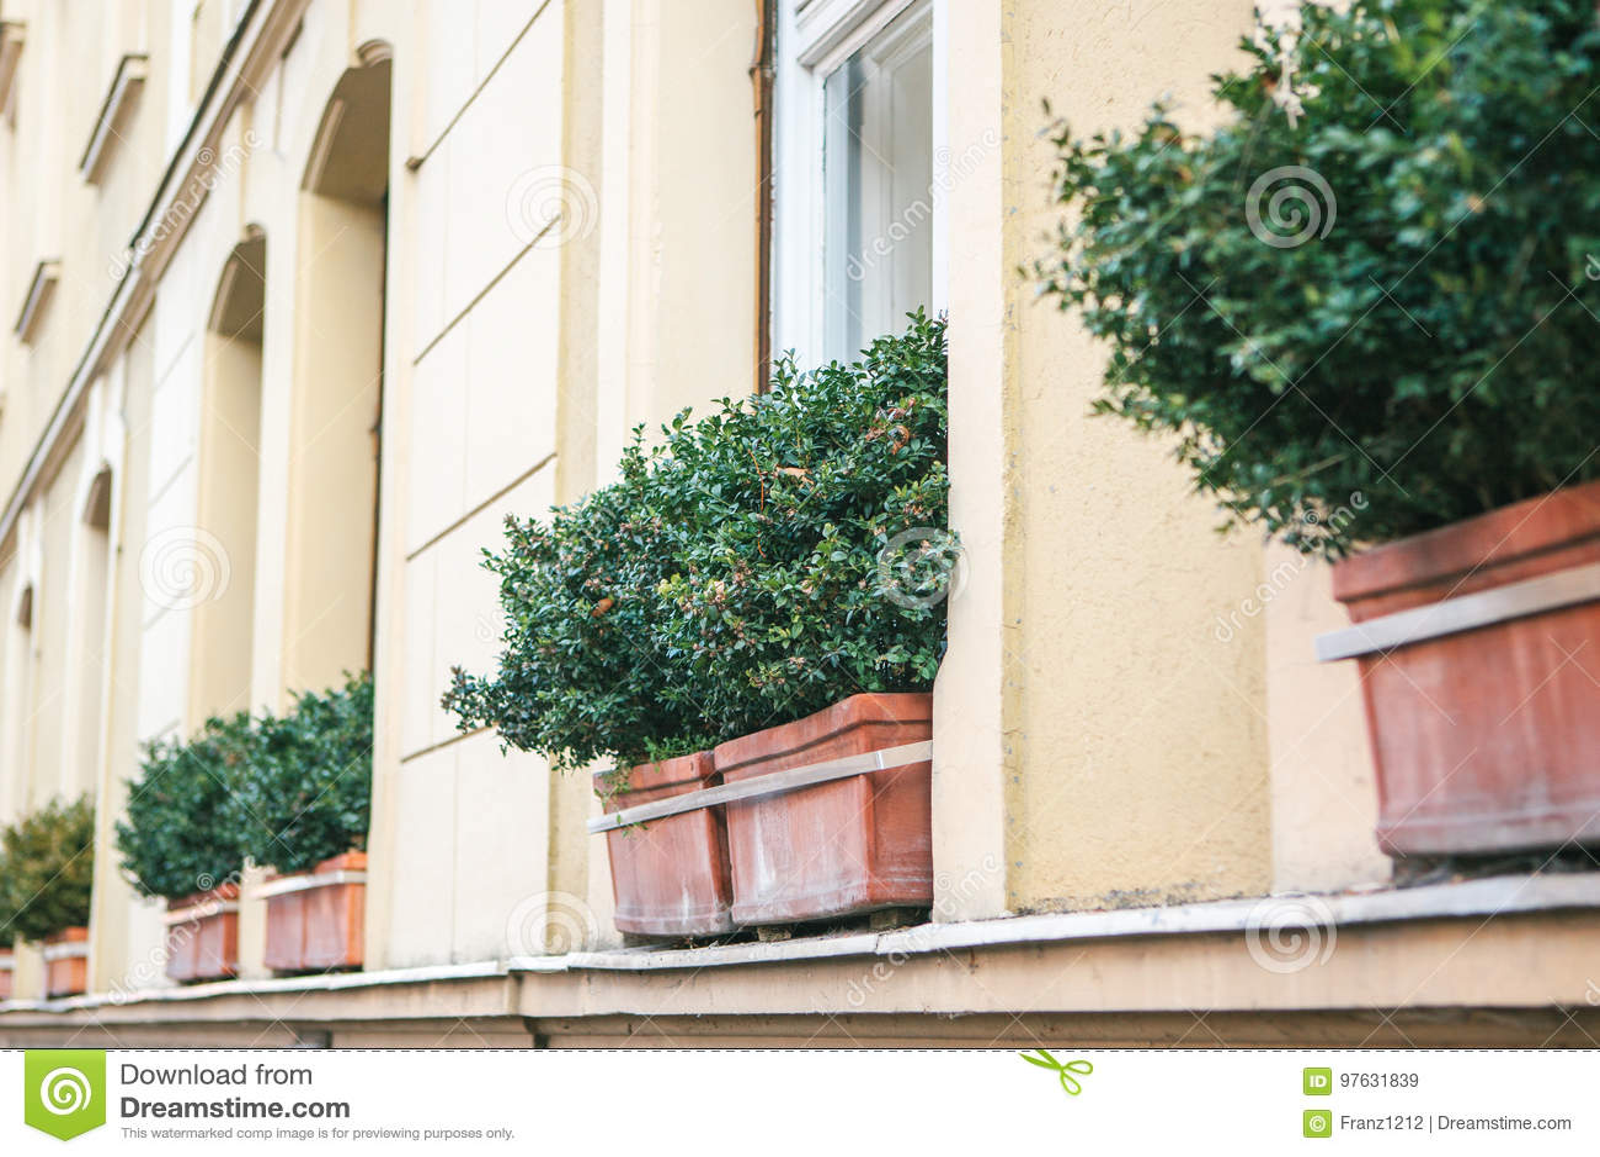 Plantas decorativas exterior fabulous plantas decorativas for Plantas decorativas de exterior